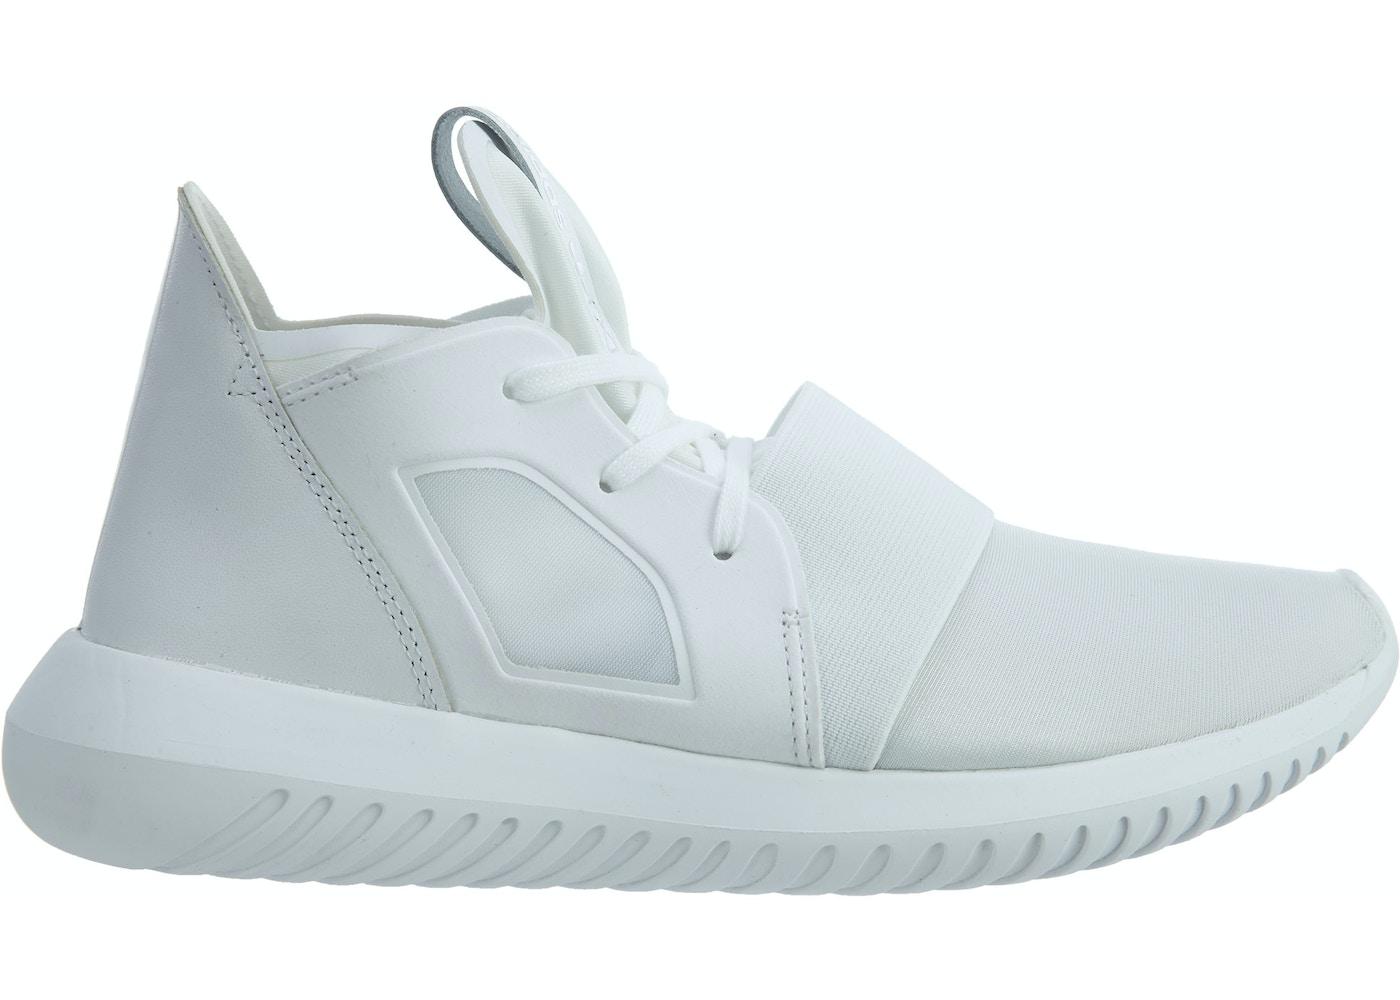 4671062b32b adidas Tubular Defiant Core White Core White (W) - S75250